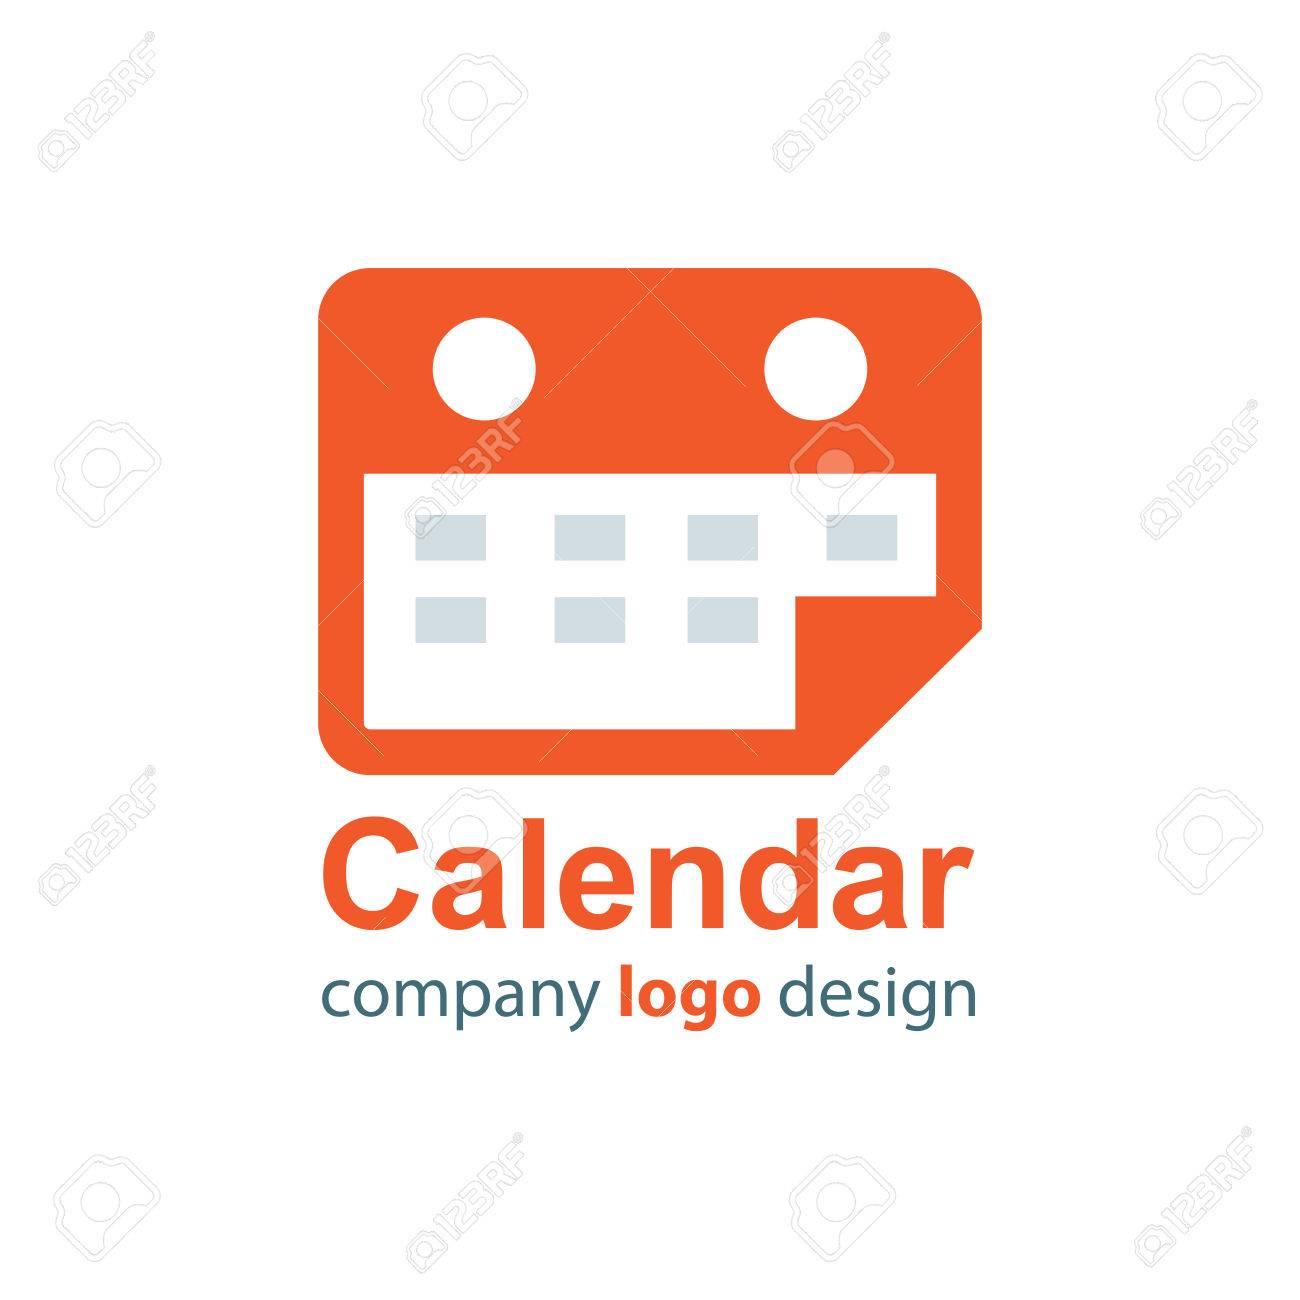 calendar logo orange style royalty free cliparts vectors and stock